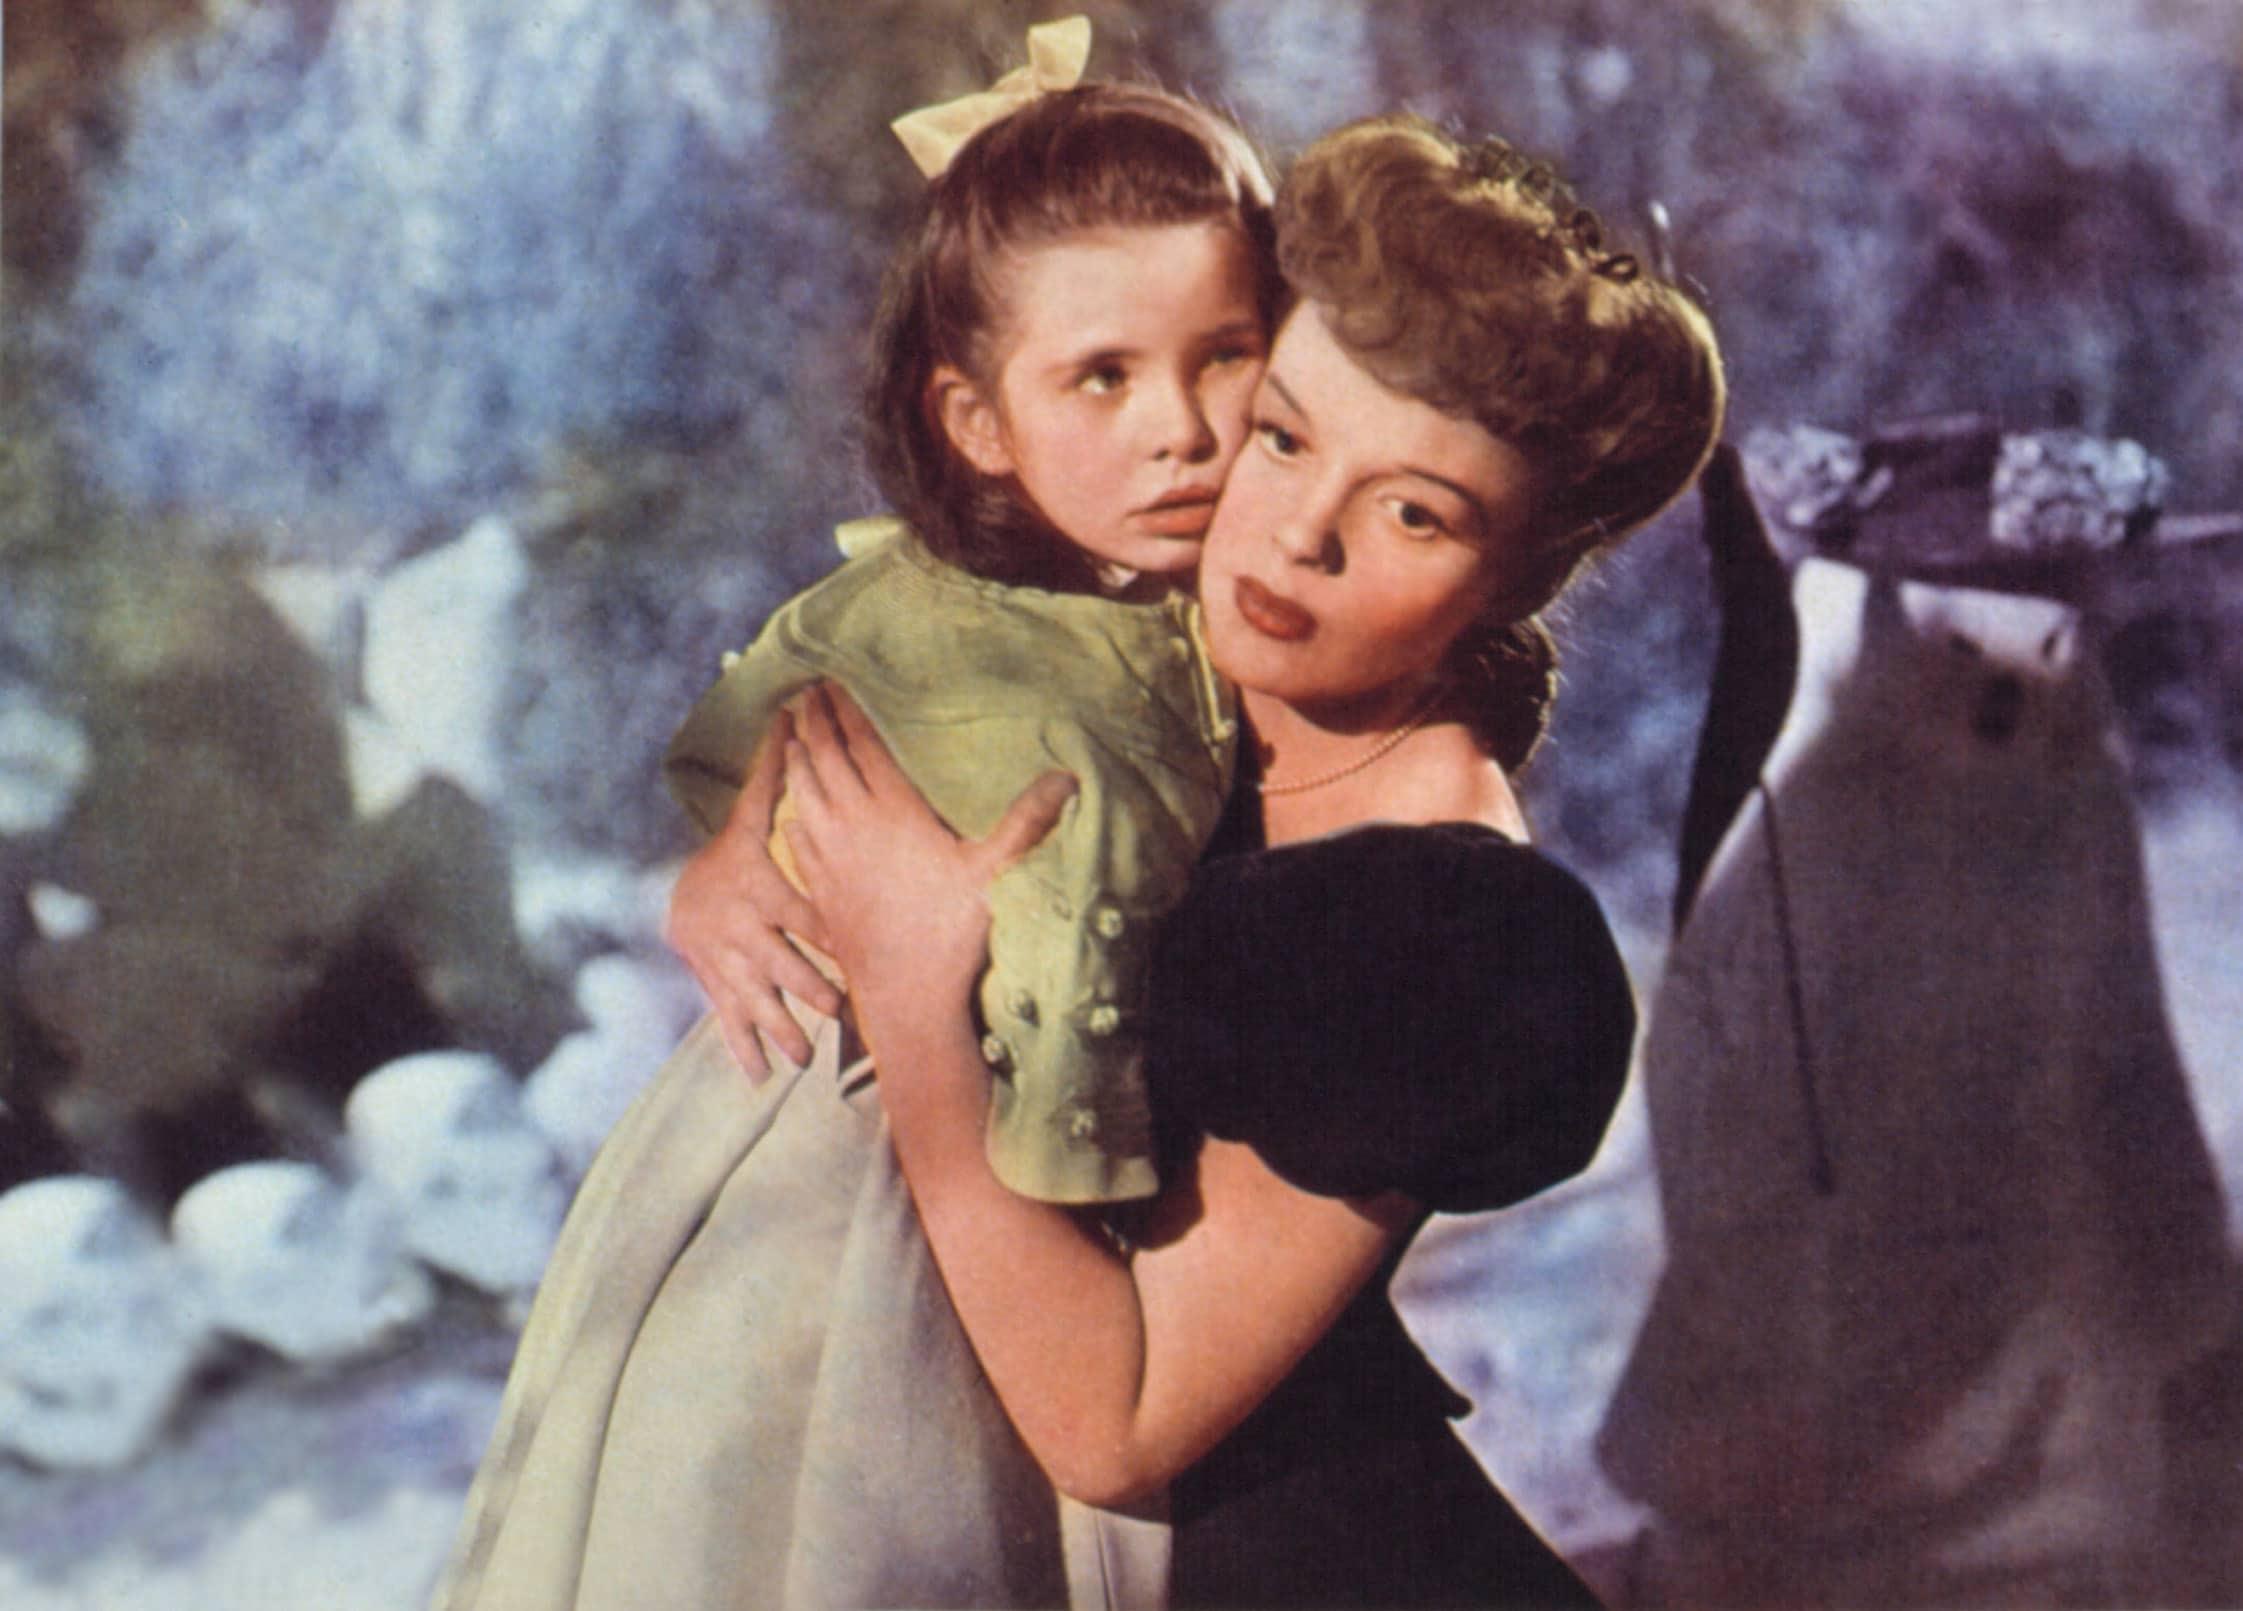 MEET ME IN ST. LOUIS, Margaret O'Brien, Judy Garland, 1944